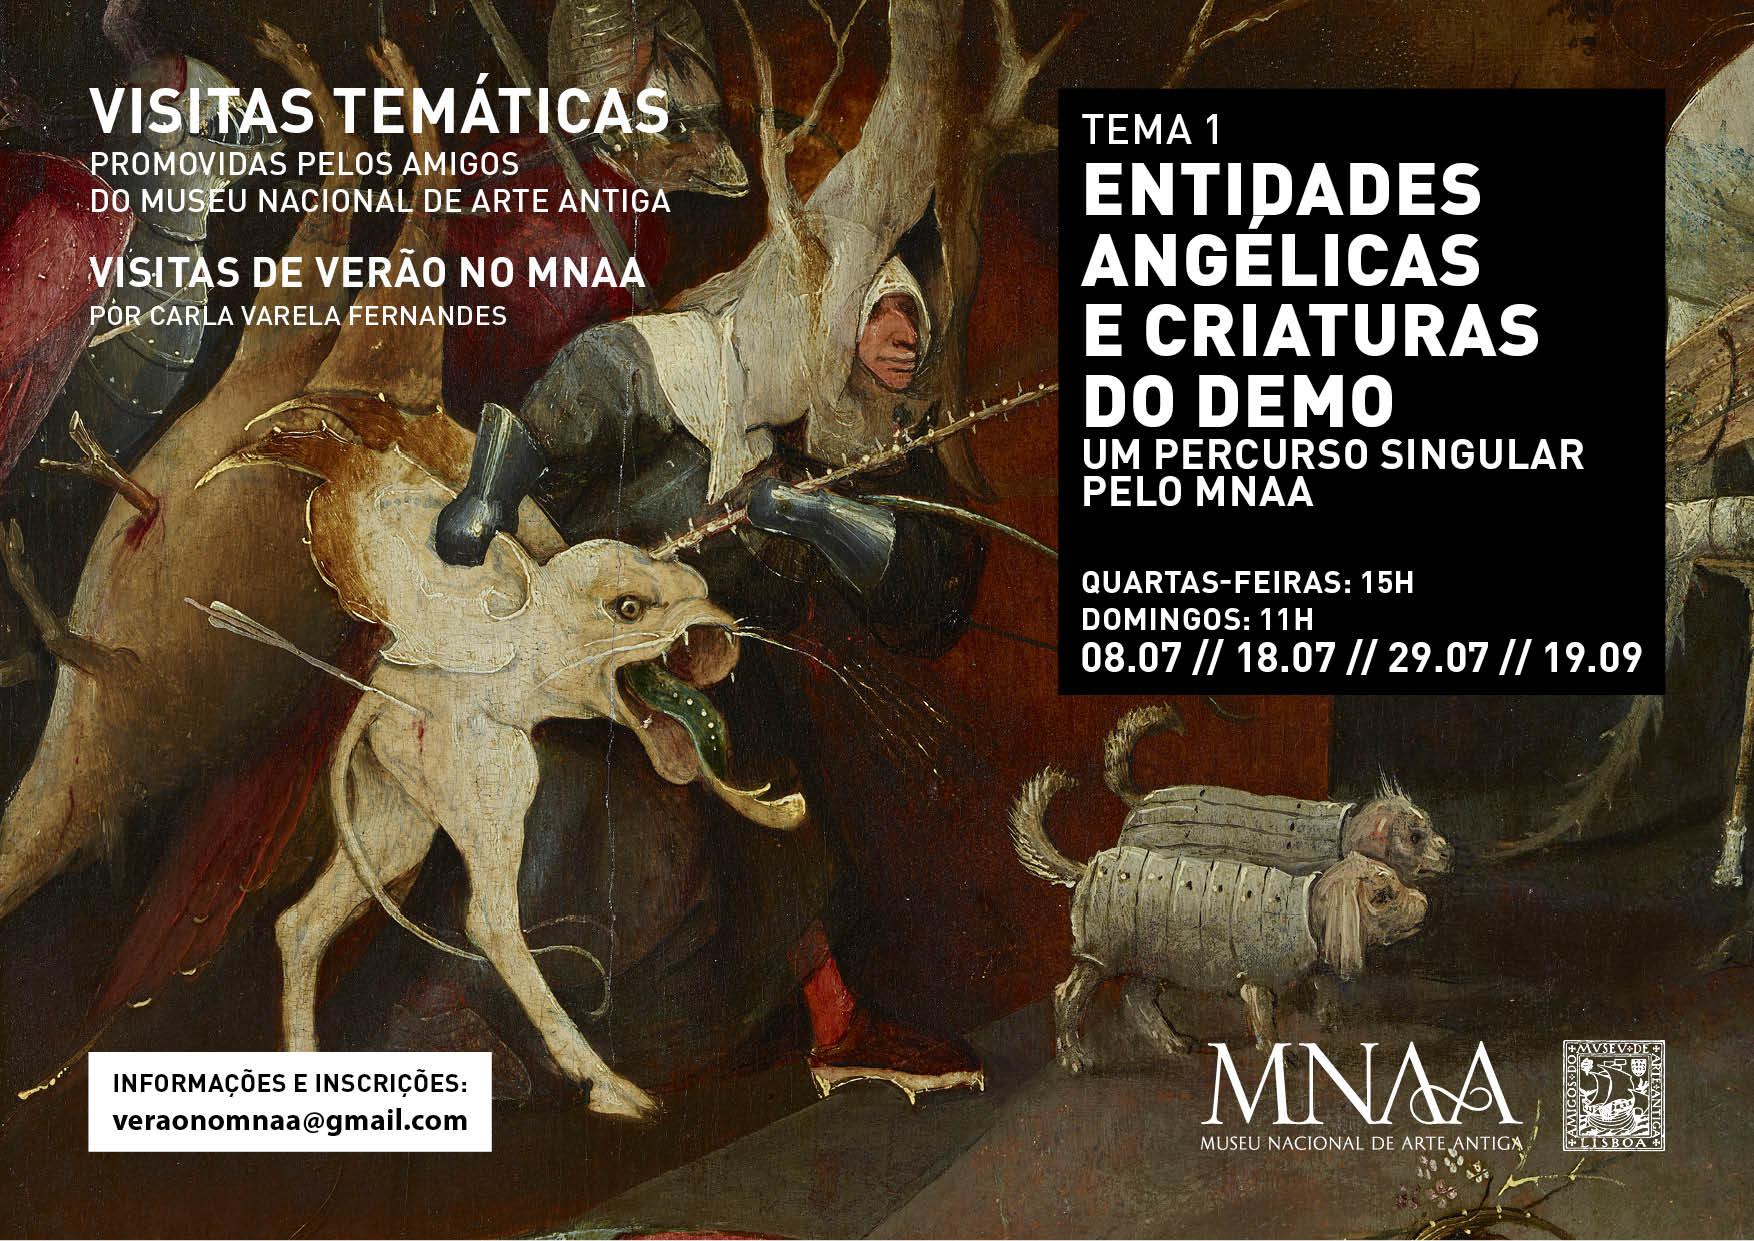 TEMA 1 - visitas temáticas grupo amigos Museu Nacional de Arte Antiga